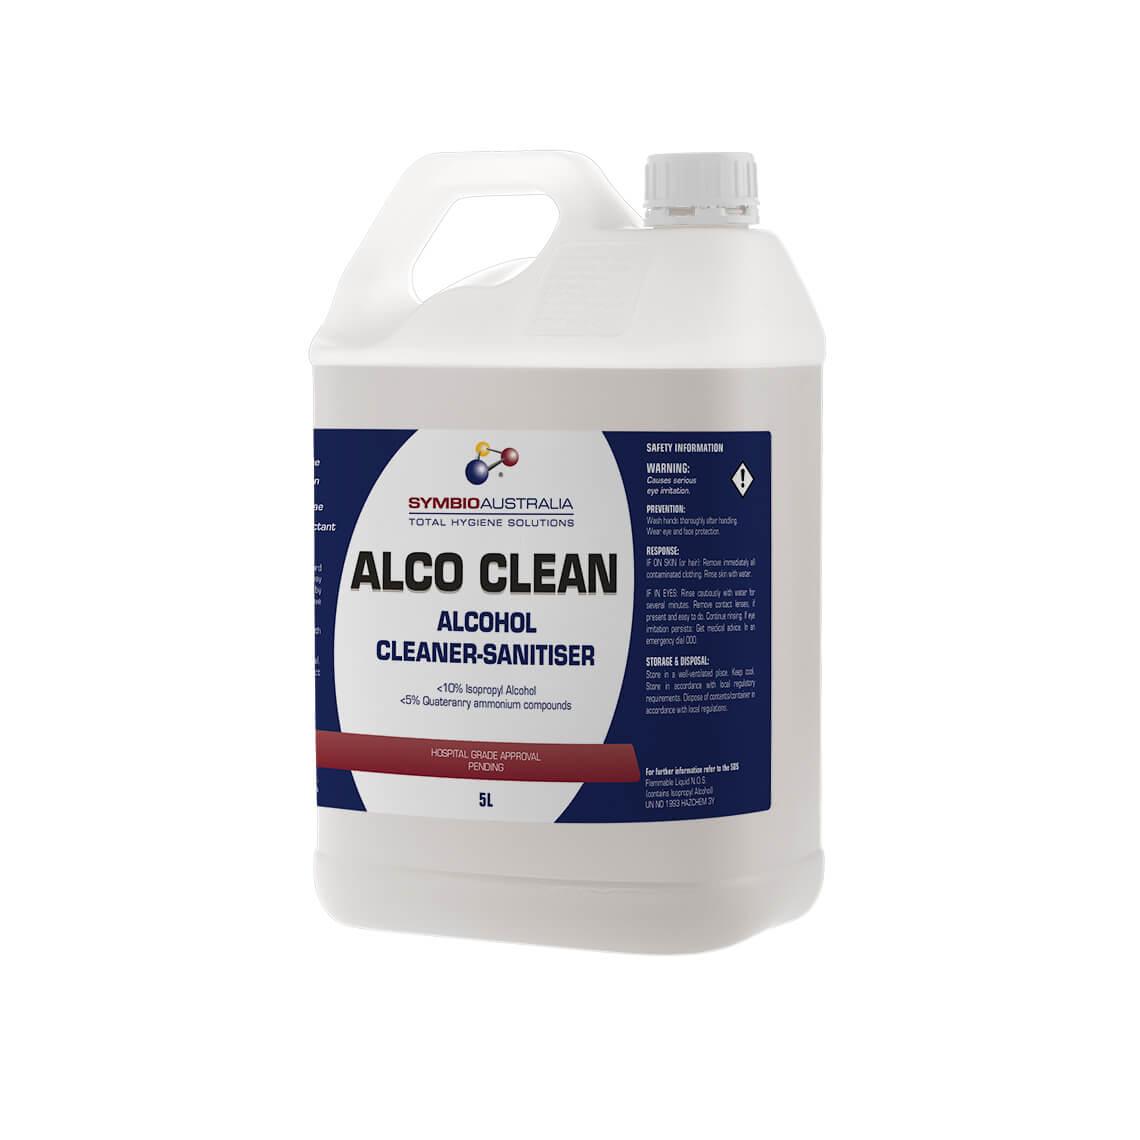 Alco Clean